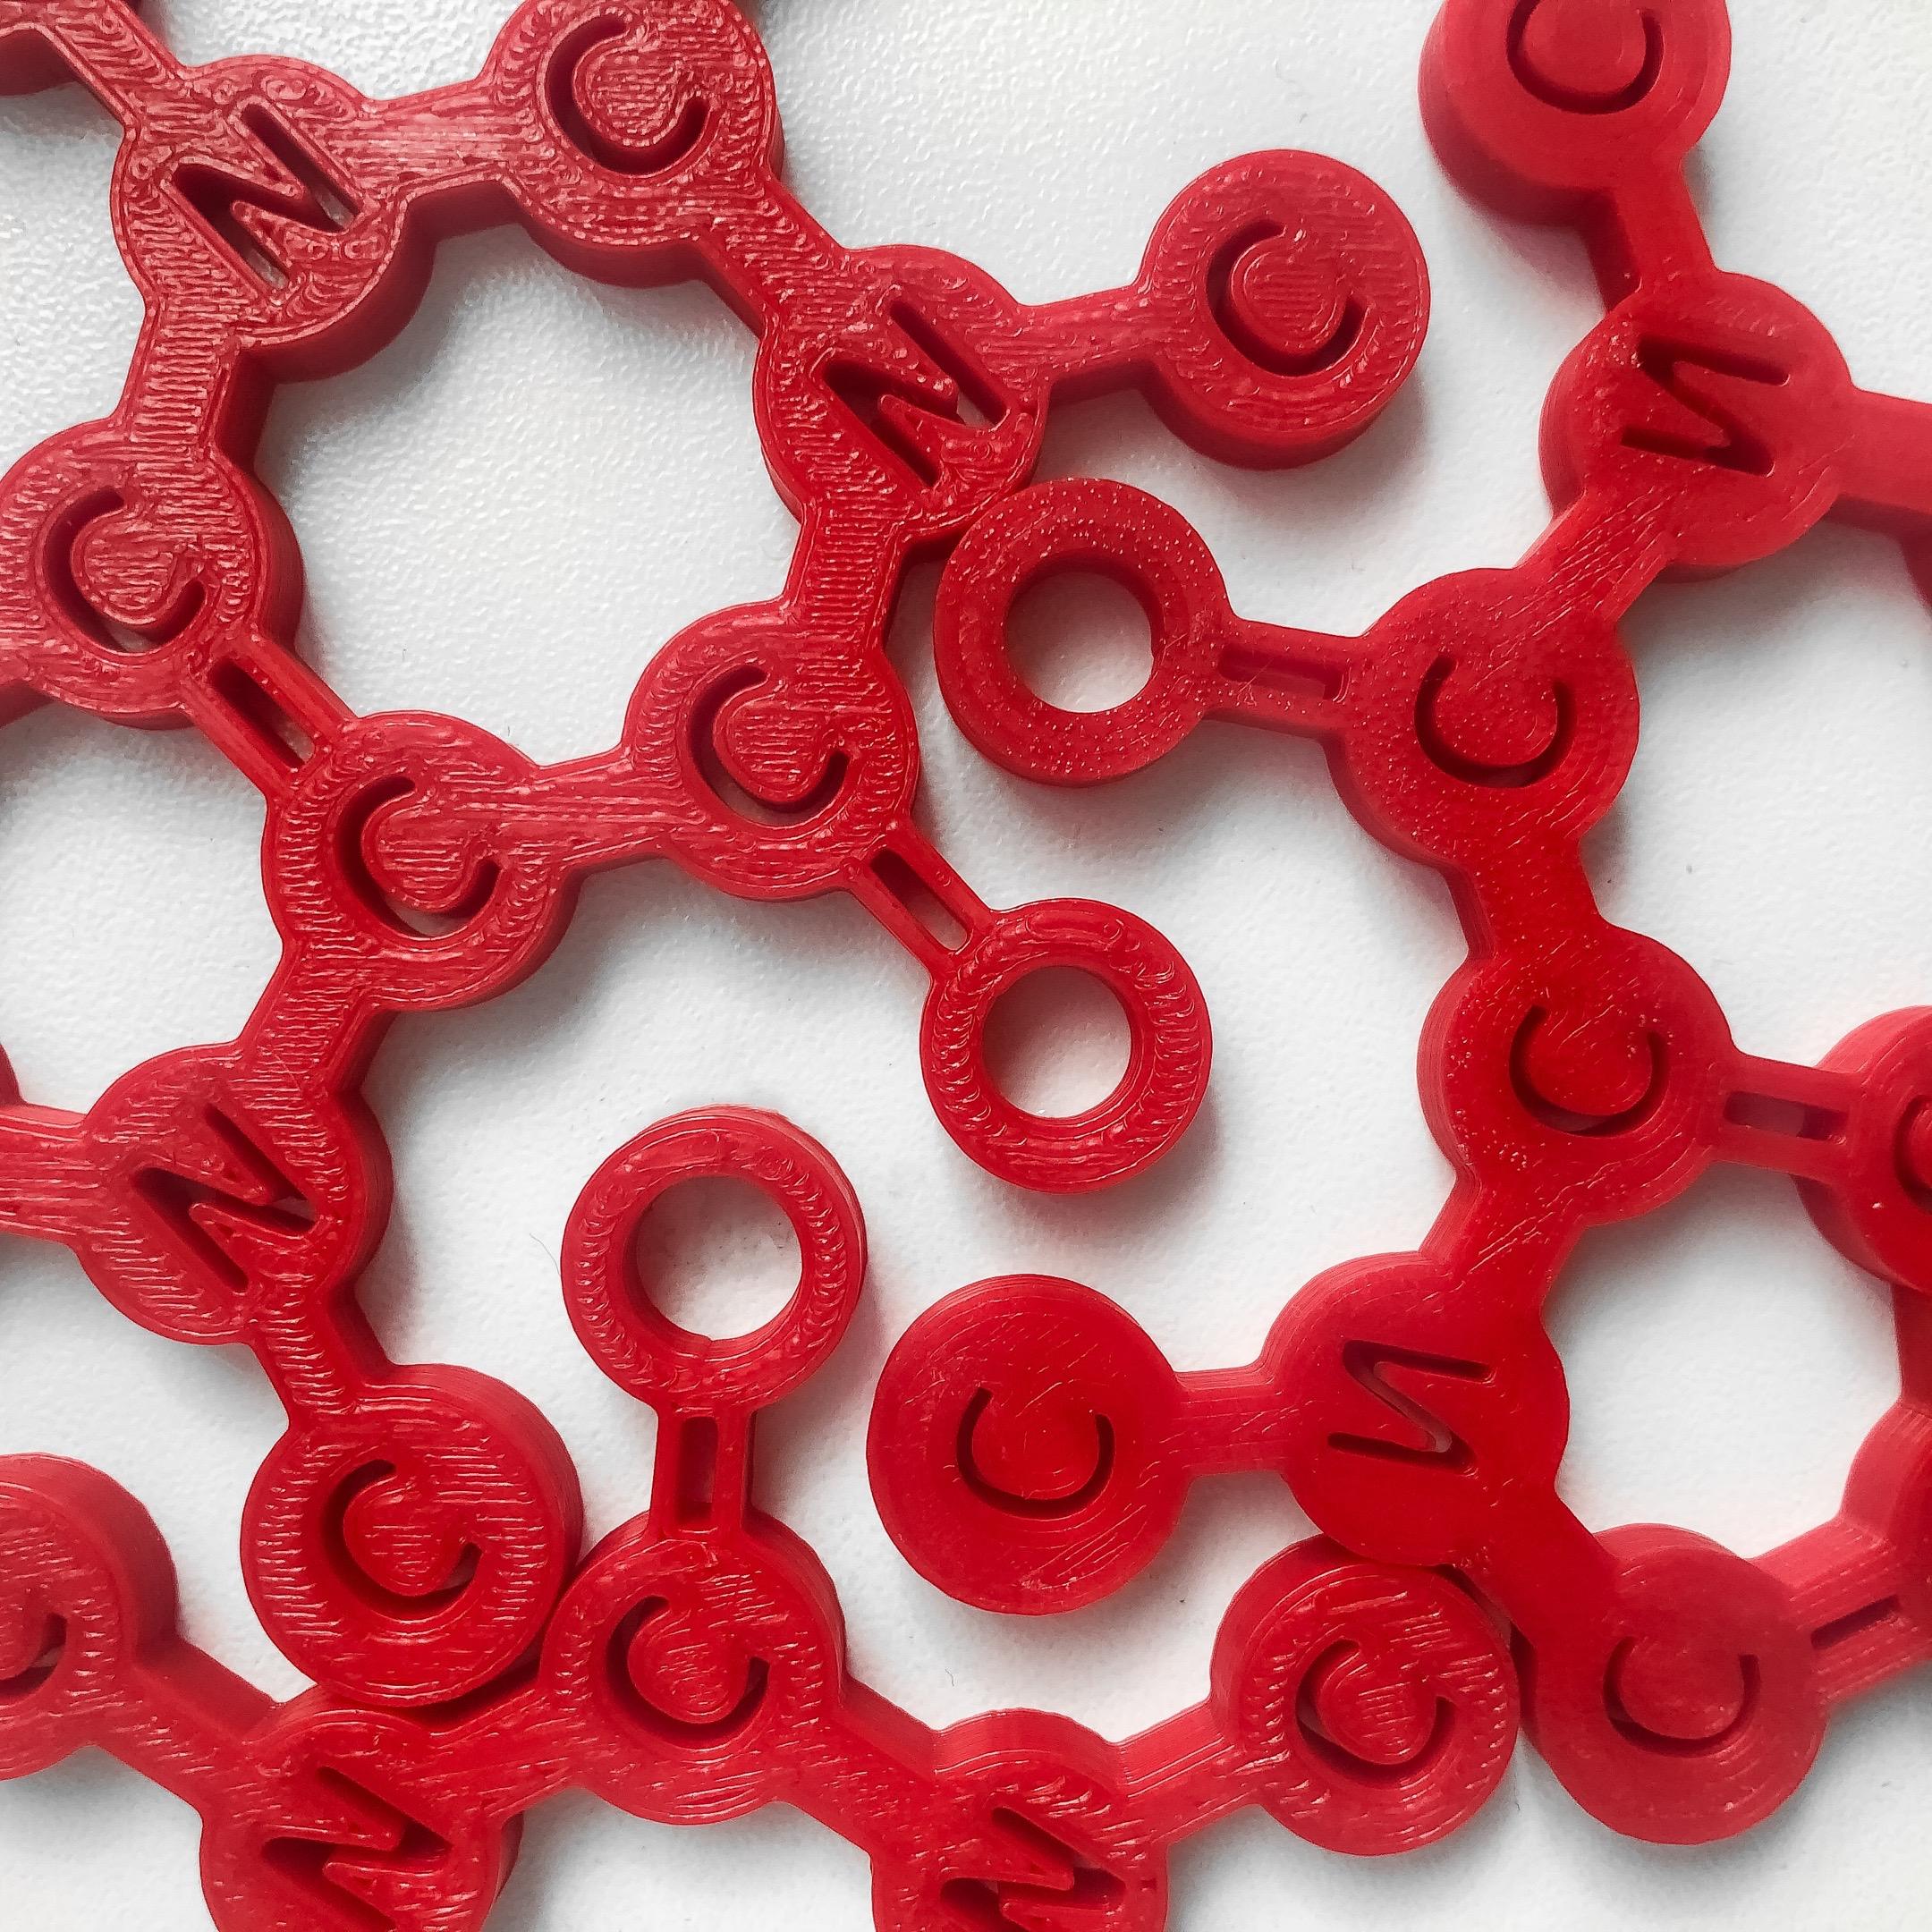 Makelab - 3D Printing Services - PLA Red Custom Color Parts